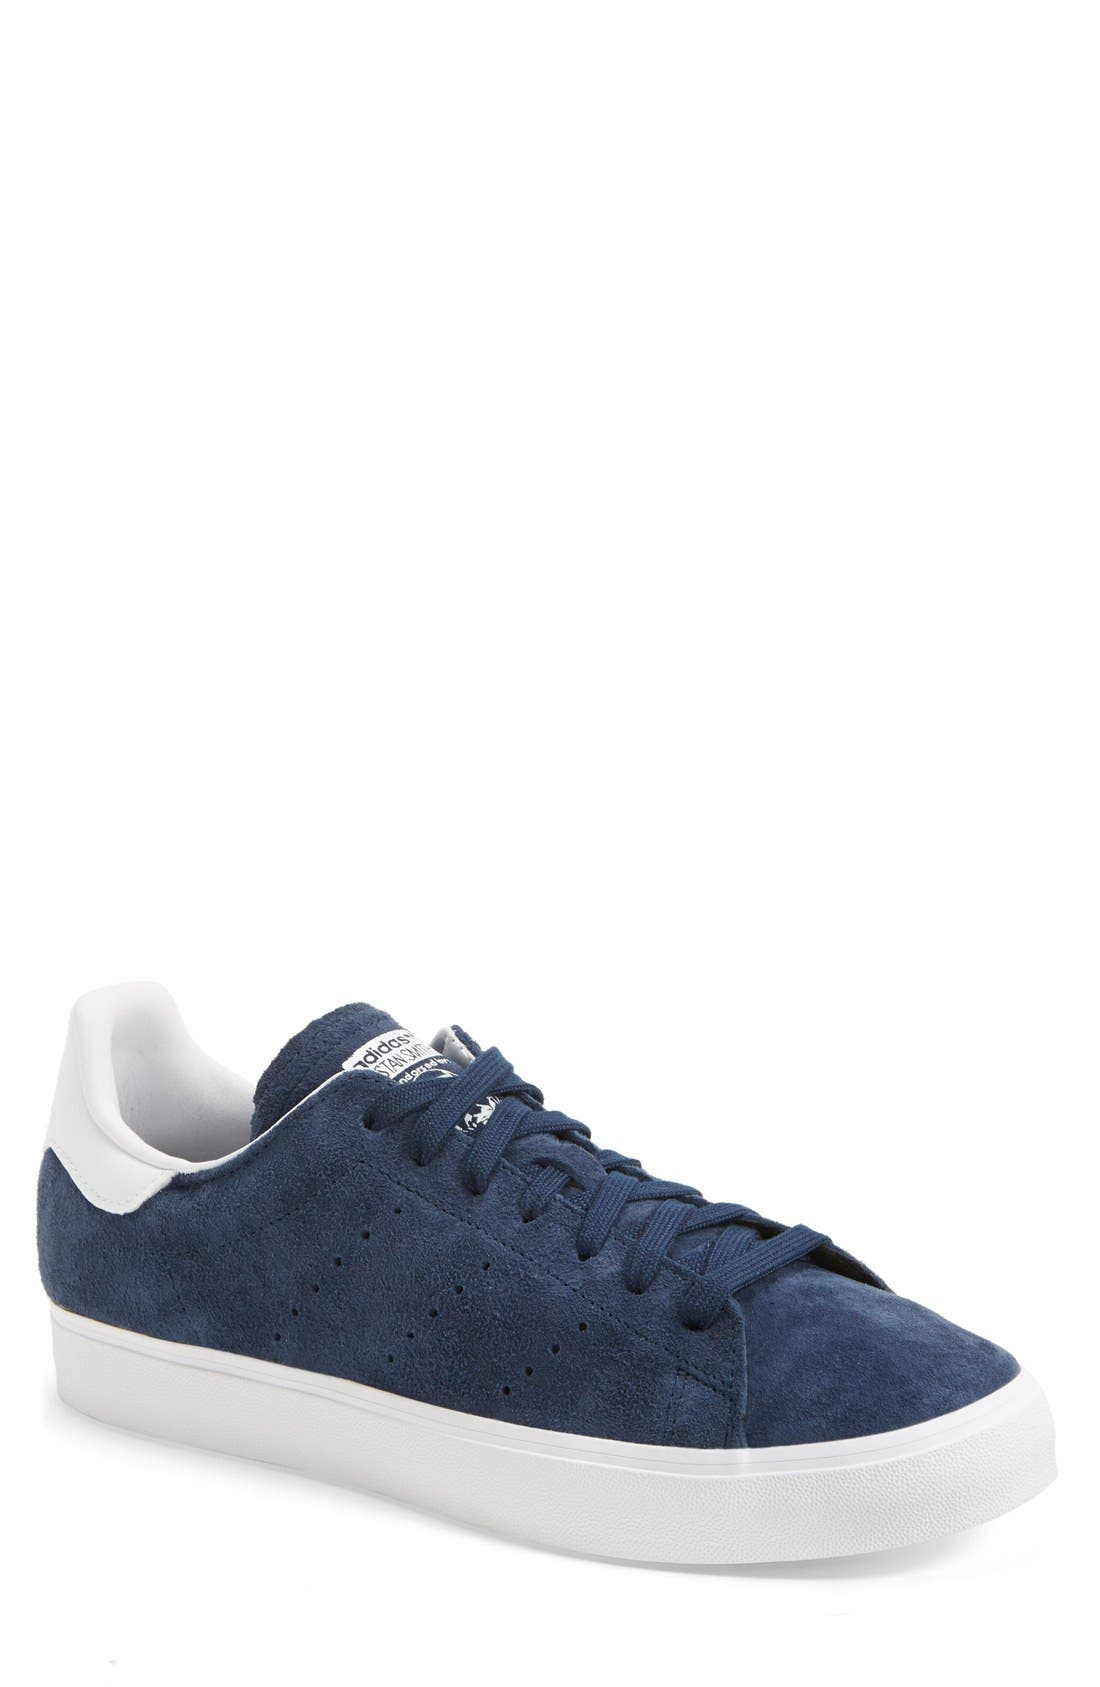 ADIDAS 'Stan Smith' Sneaker, Main, color, 415